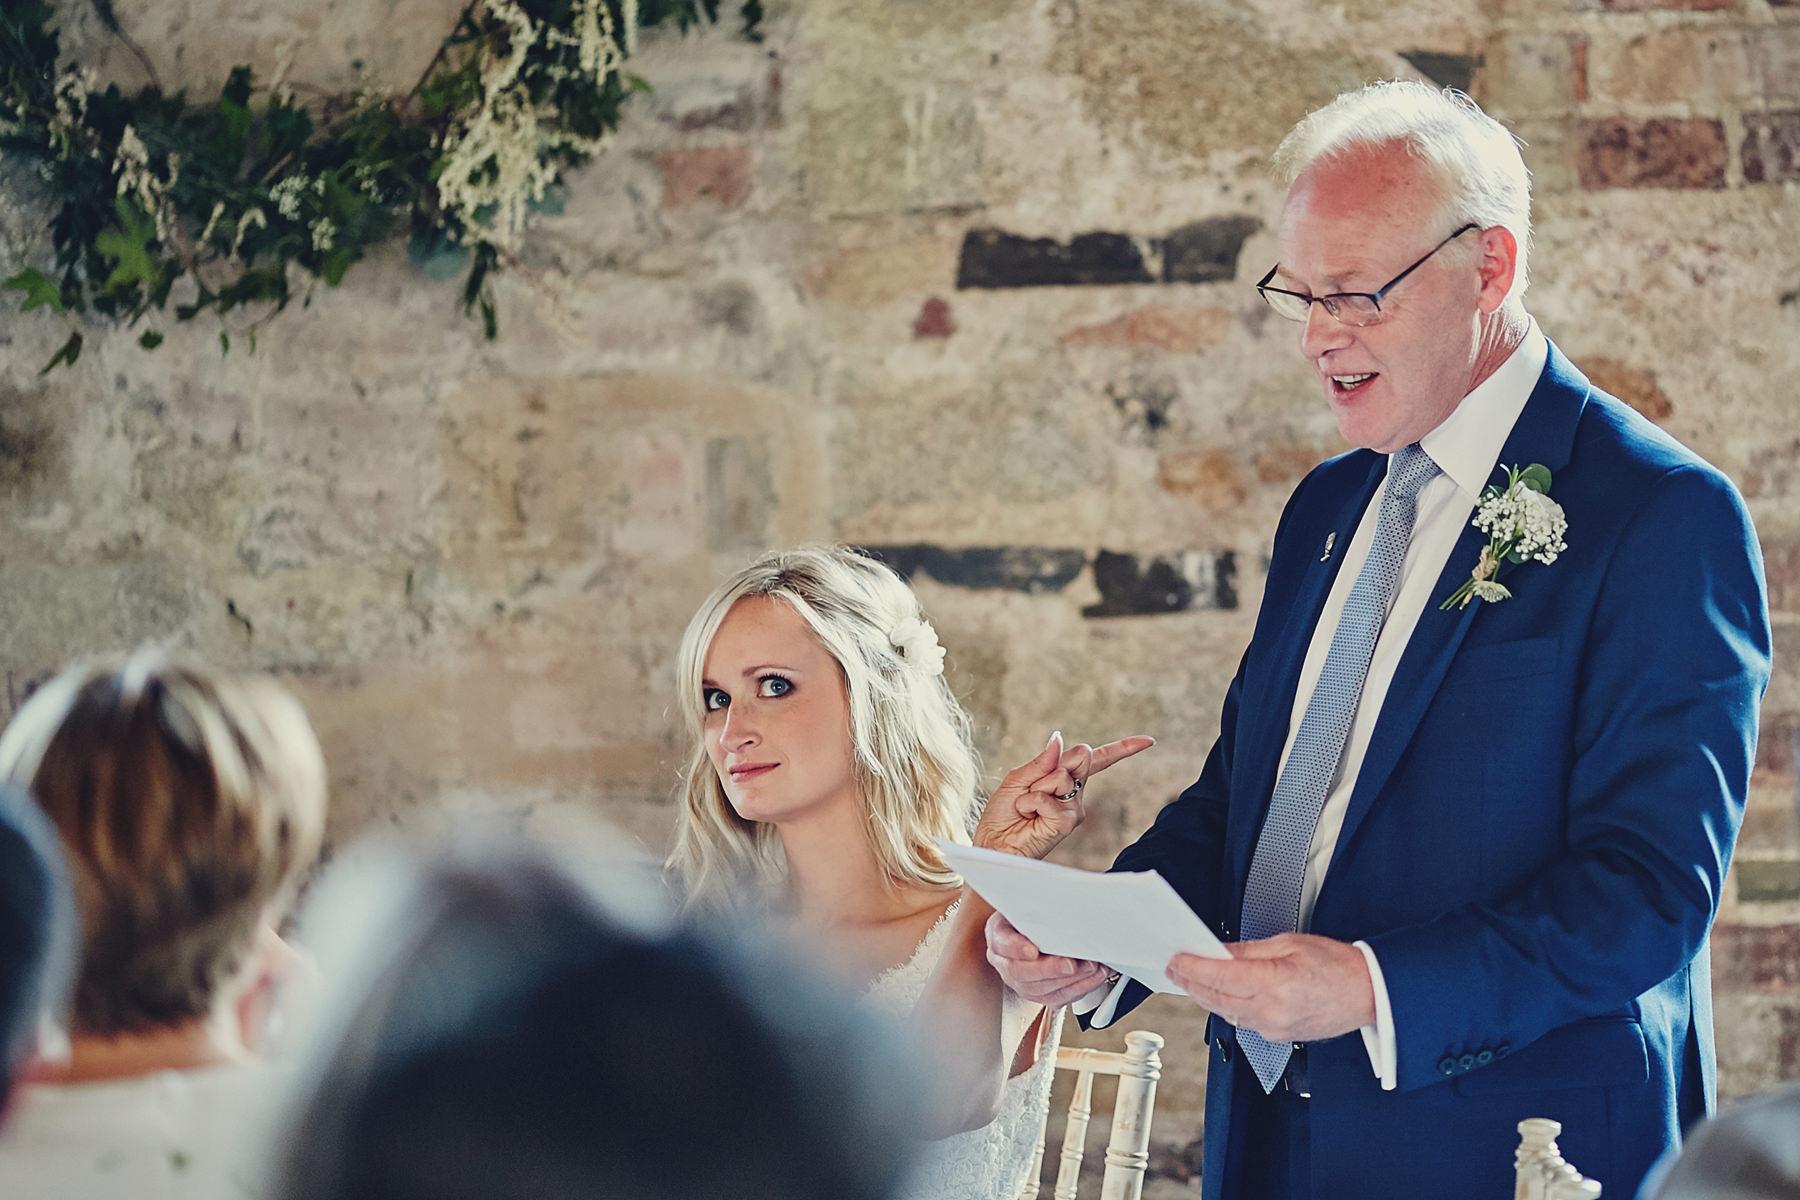 Wedding at Borris House co.Carlow 067 - Borris House wedding | Cara & David